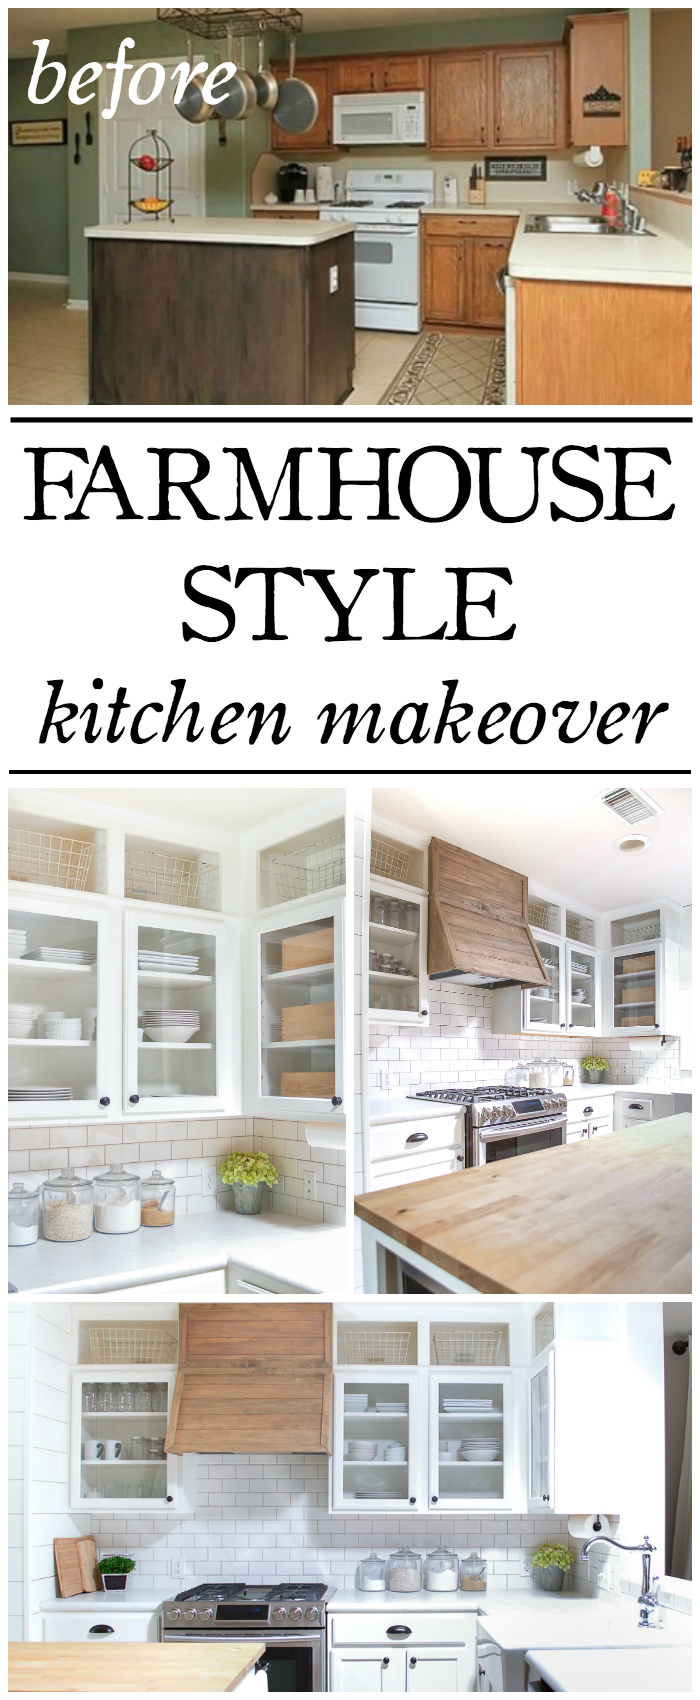 Farmhouse Style Kitchen Makeover Reveal | Builder grade kitchen ...